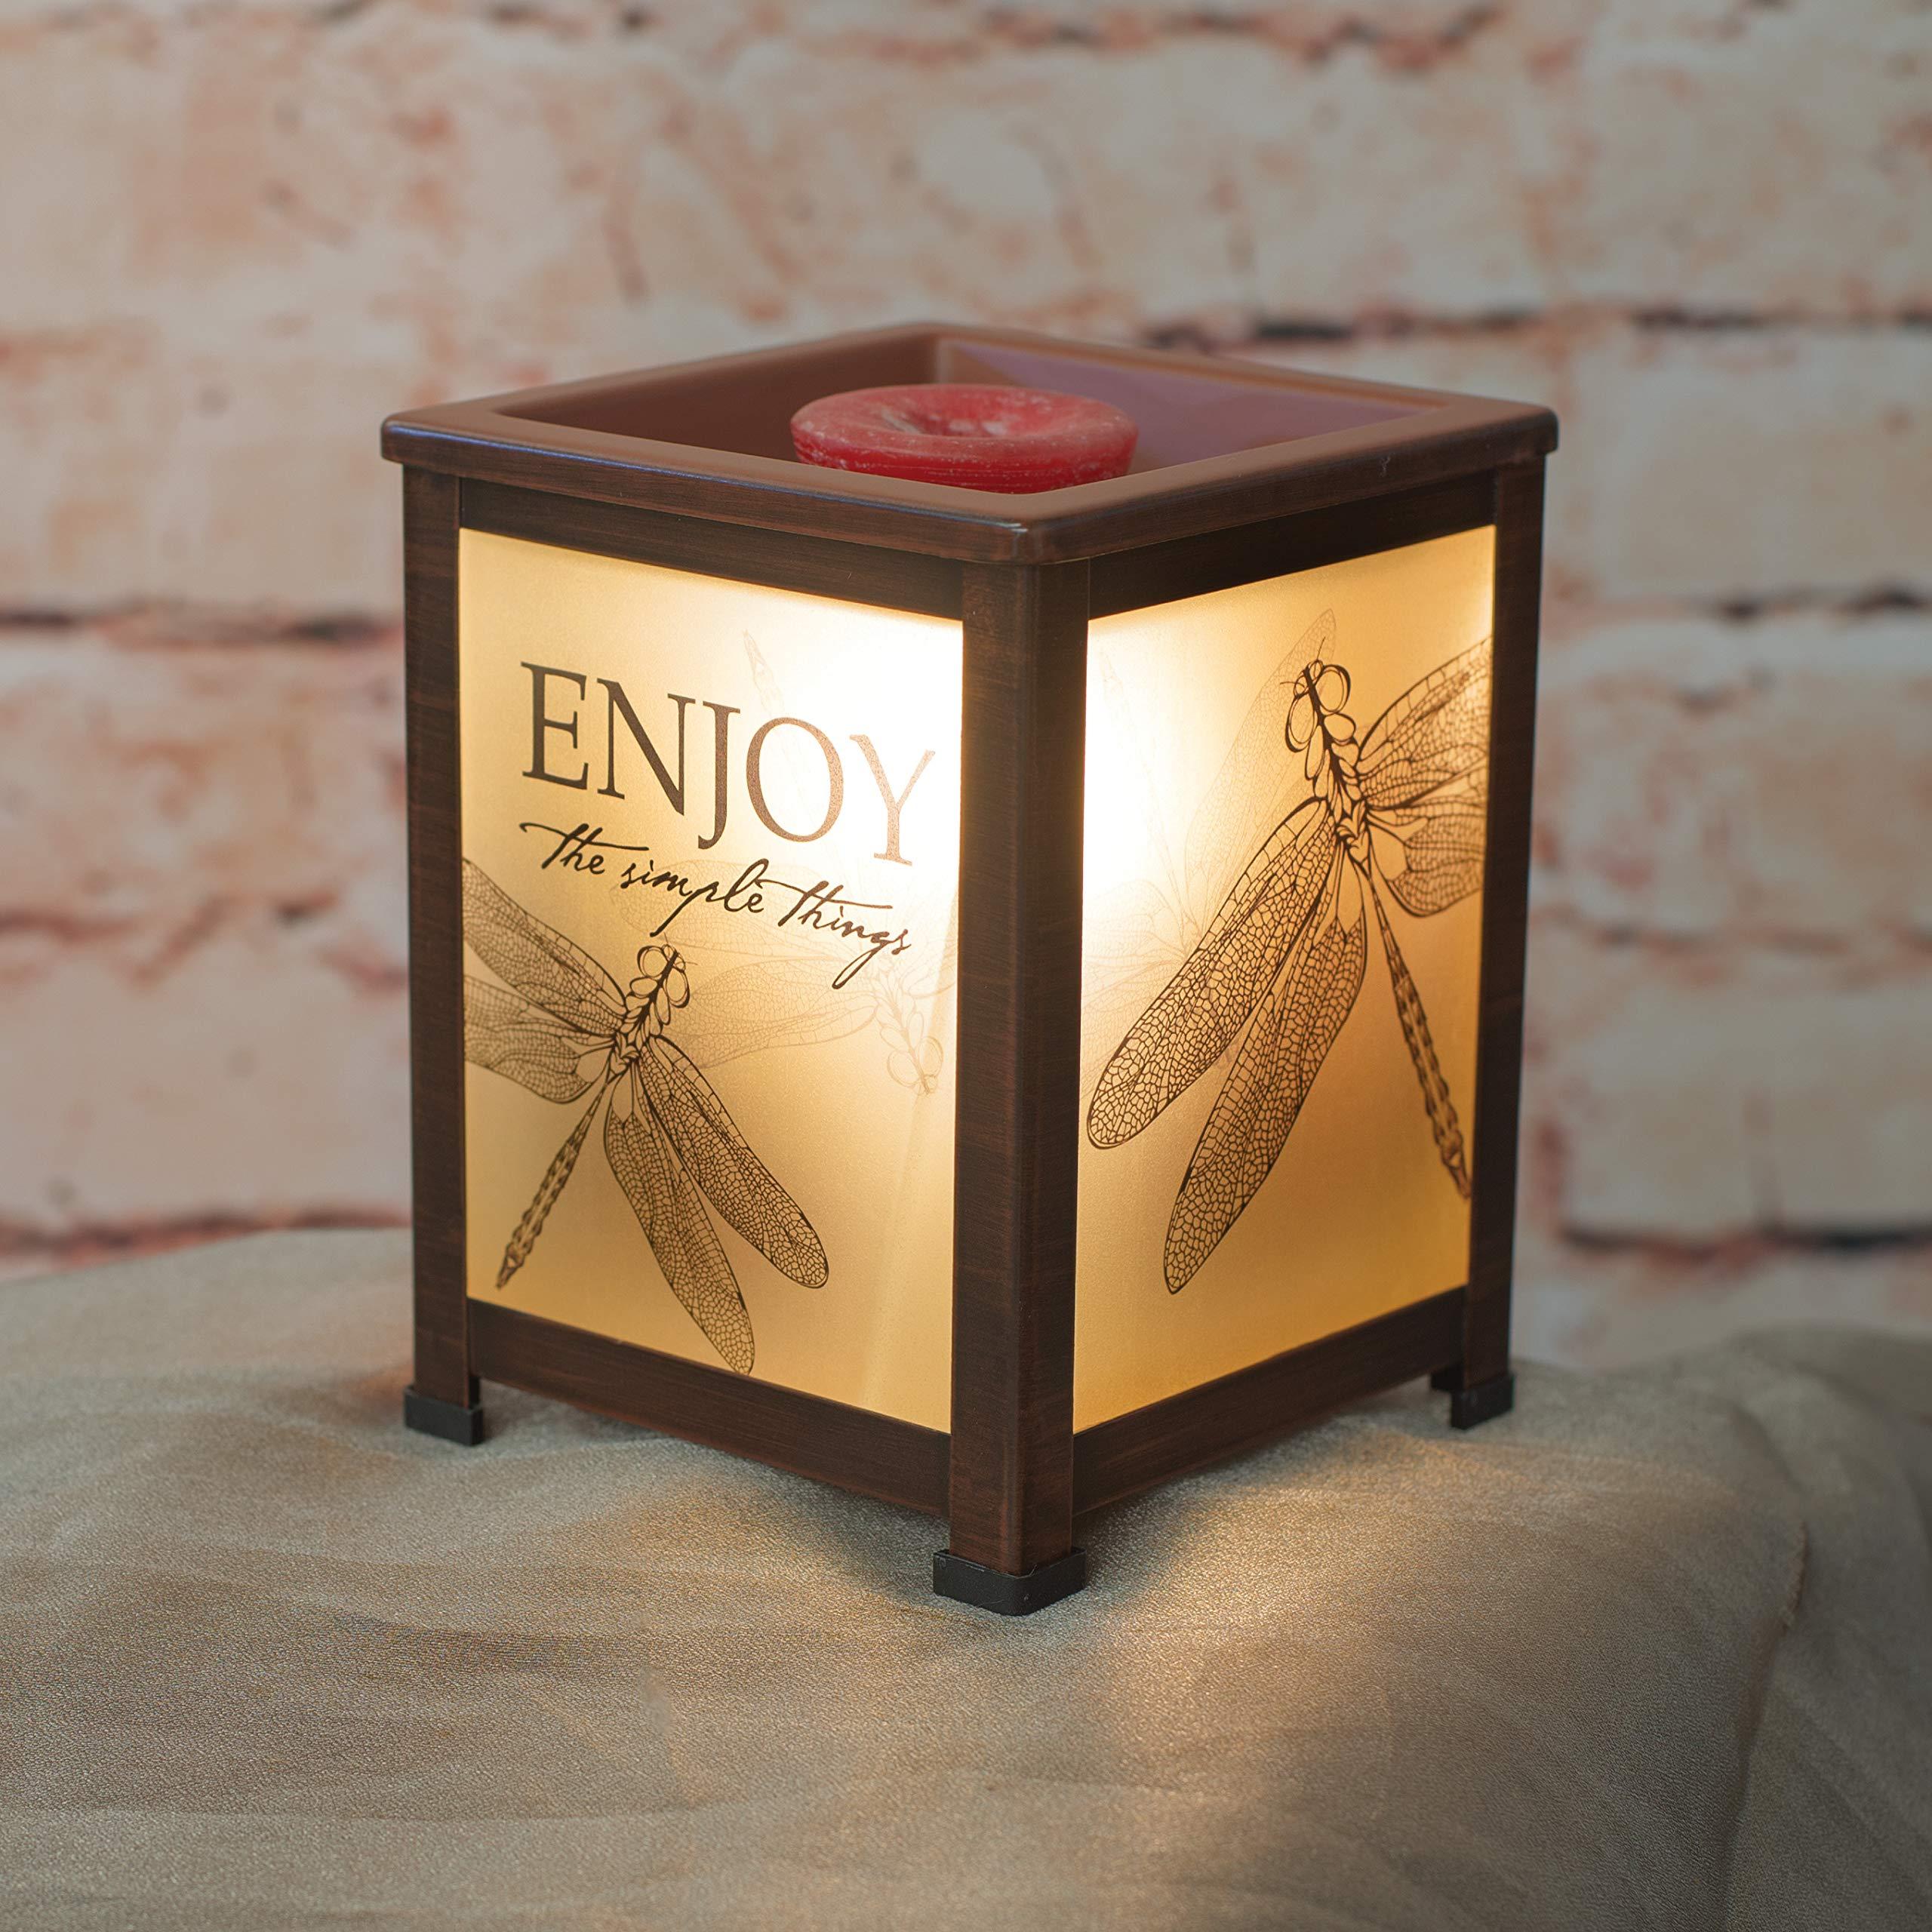 Elanze Designs Enjoy Simple Things Dragonfly Copper Tone Metal Electrical Wax Tart & Oil Glass Lantern Warmer by Elanze Designs (Image #2)